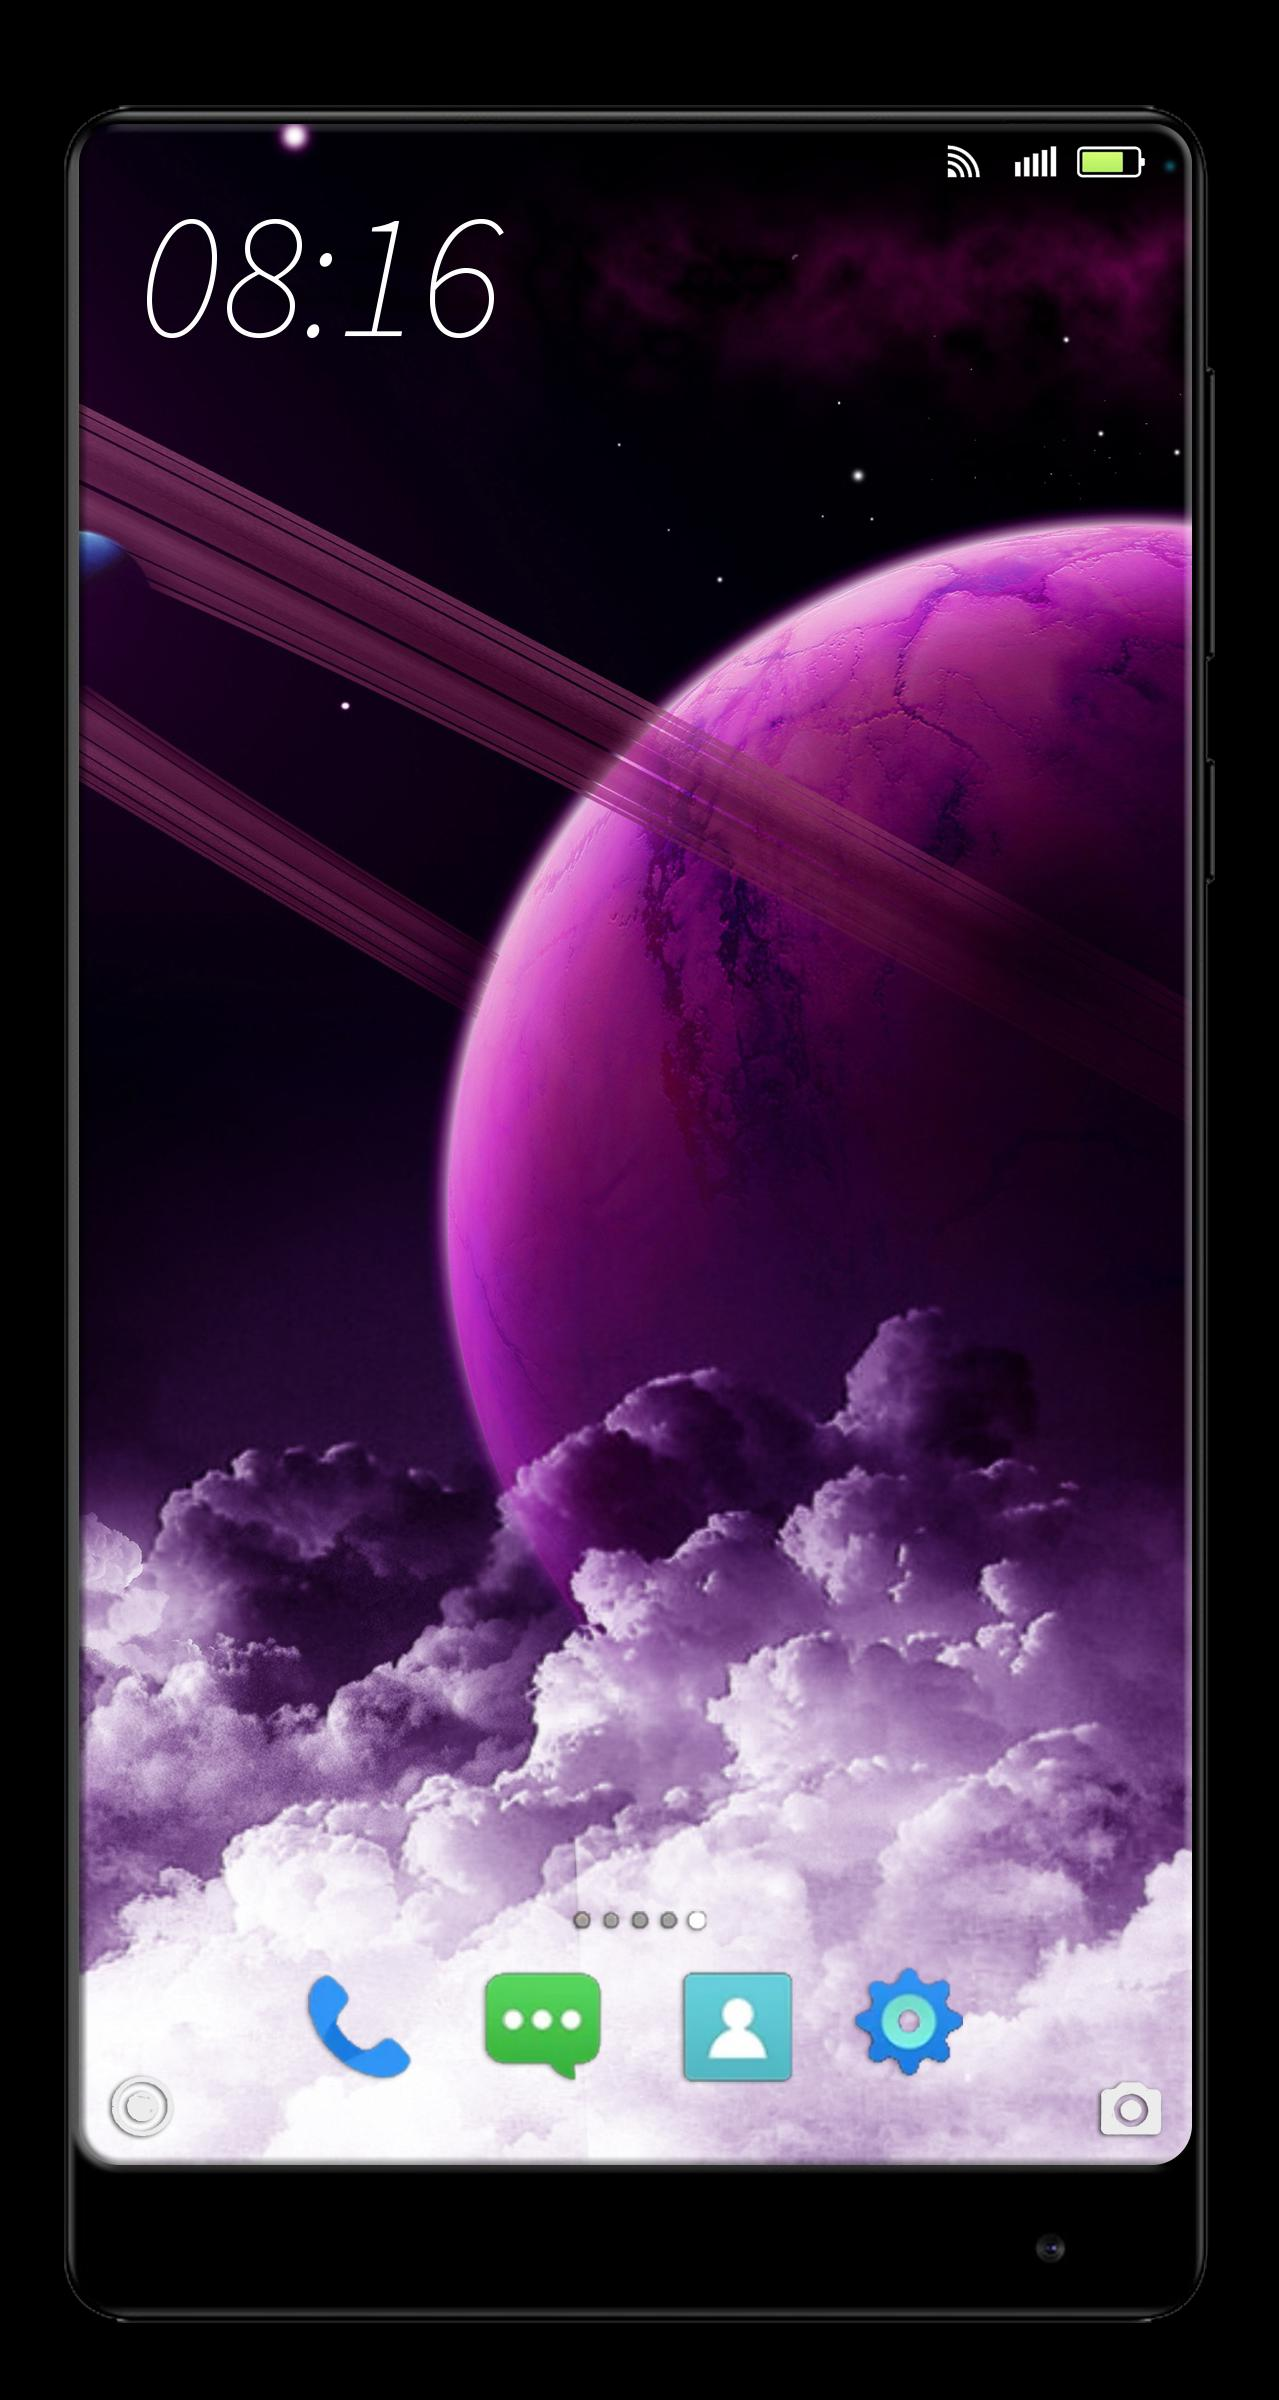 Sfondi Universo 4k For Android Apk Download